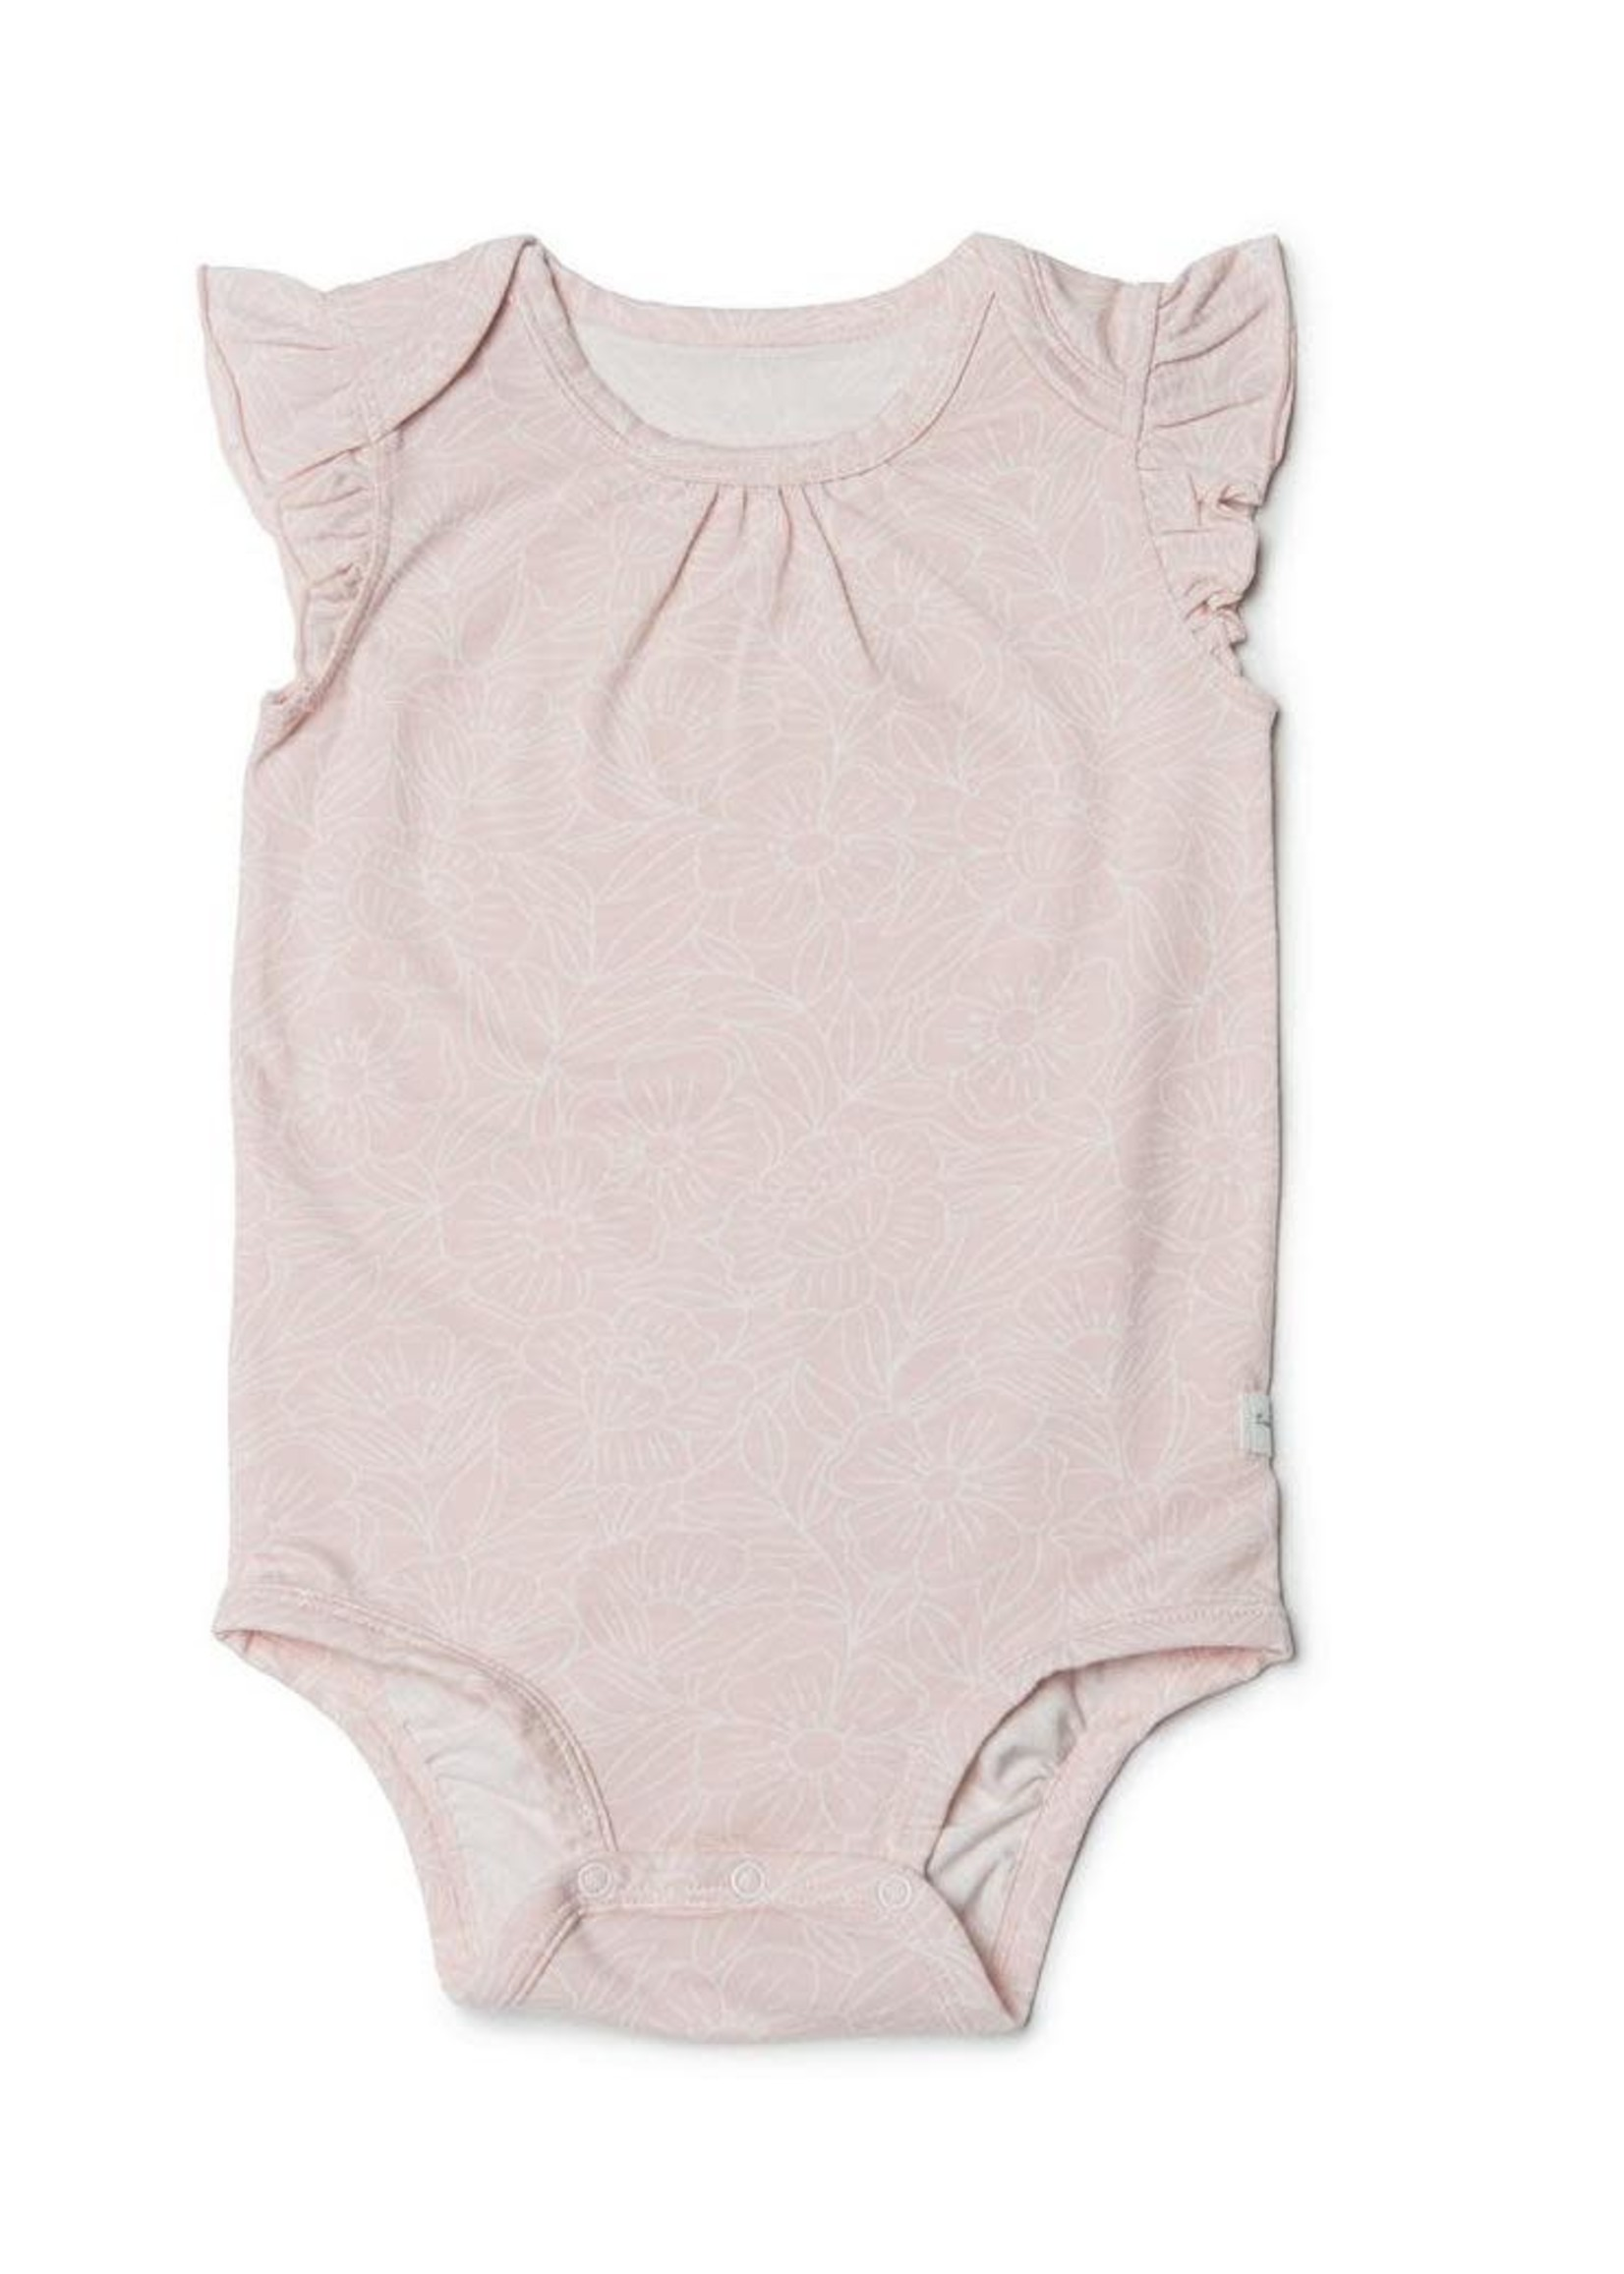 Loulou Lollipop Loulou Lollipop, Girl's Sepia Rose Floral Short Sleeve Bodysuit in TENCEL™